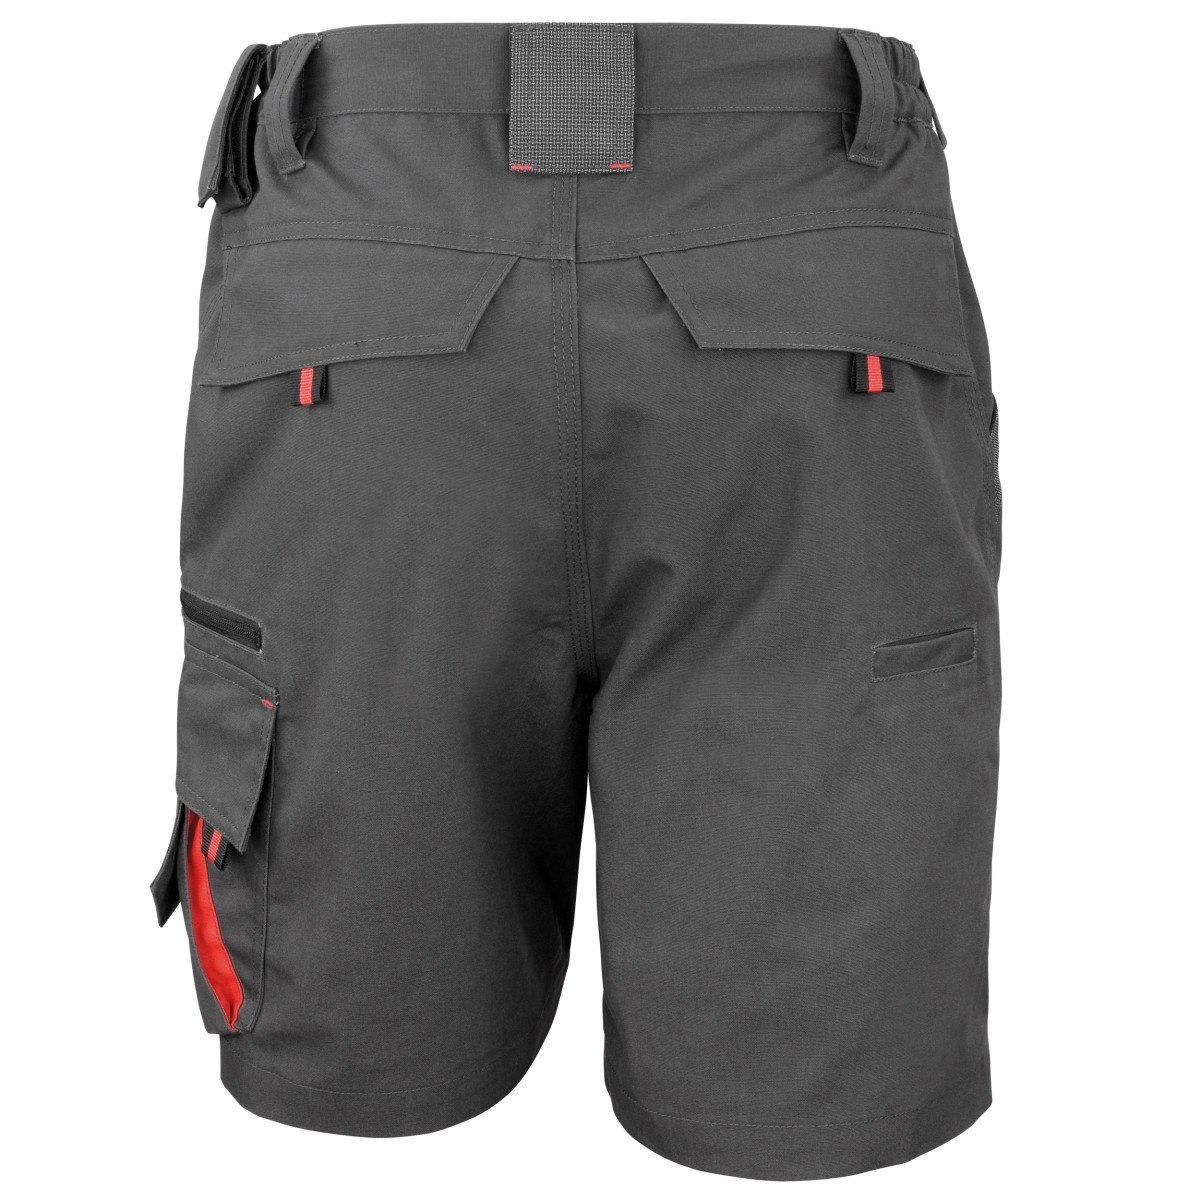 Result Workguard Unisex Technical Work Shorts (M) (Grey/Black)